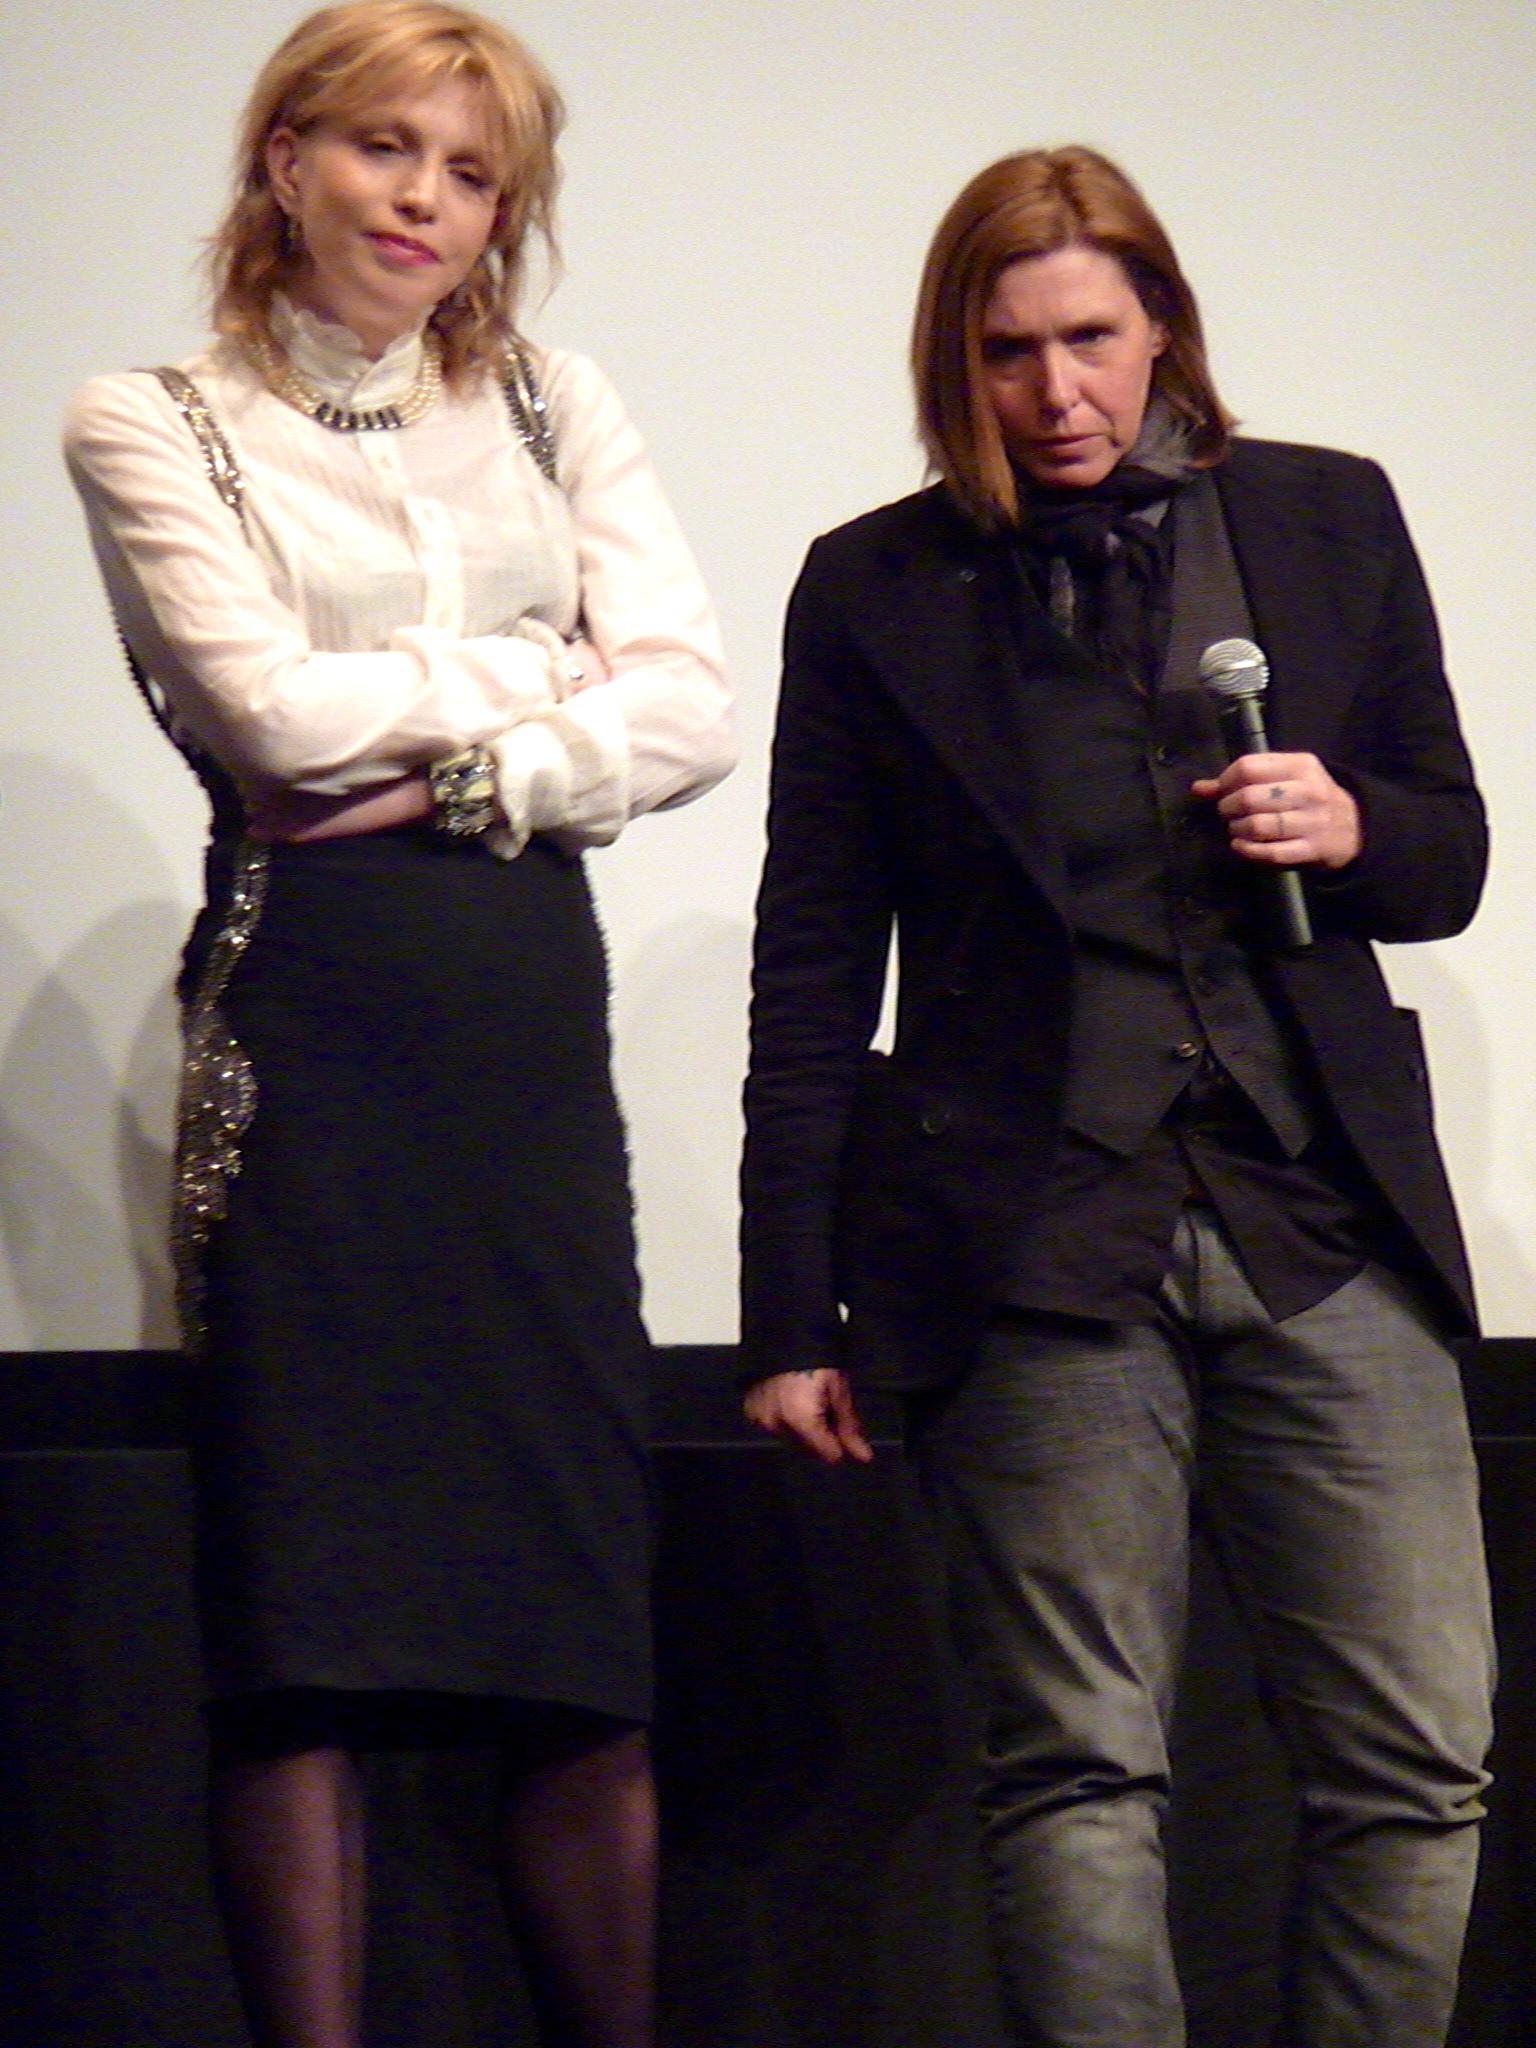 File:Courtney Love Patty Schemel MOMA 2012.jpg - Wikimedia ...